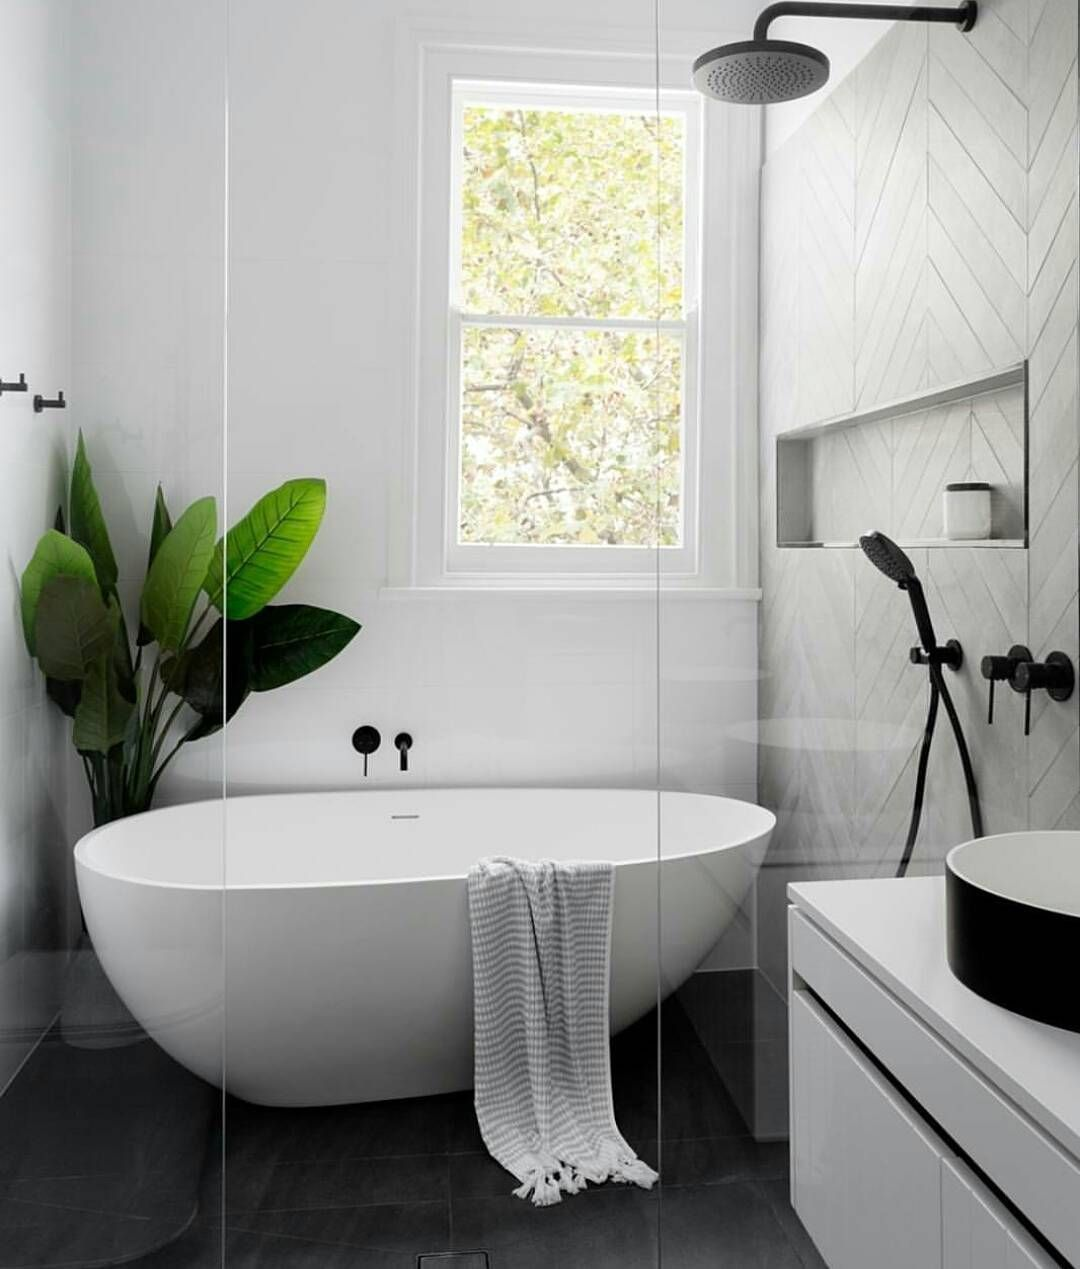 Design von badezimmer repost mintempire create this bathroom look with our olivia stone